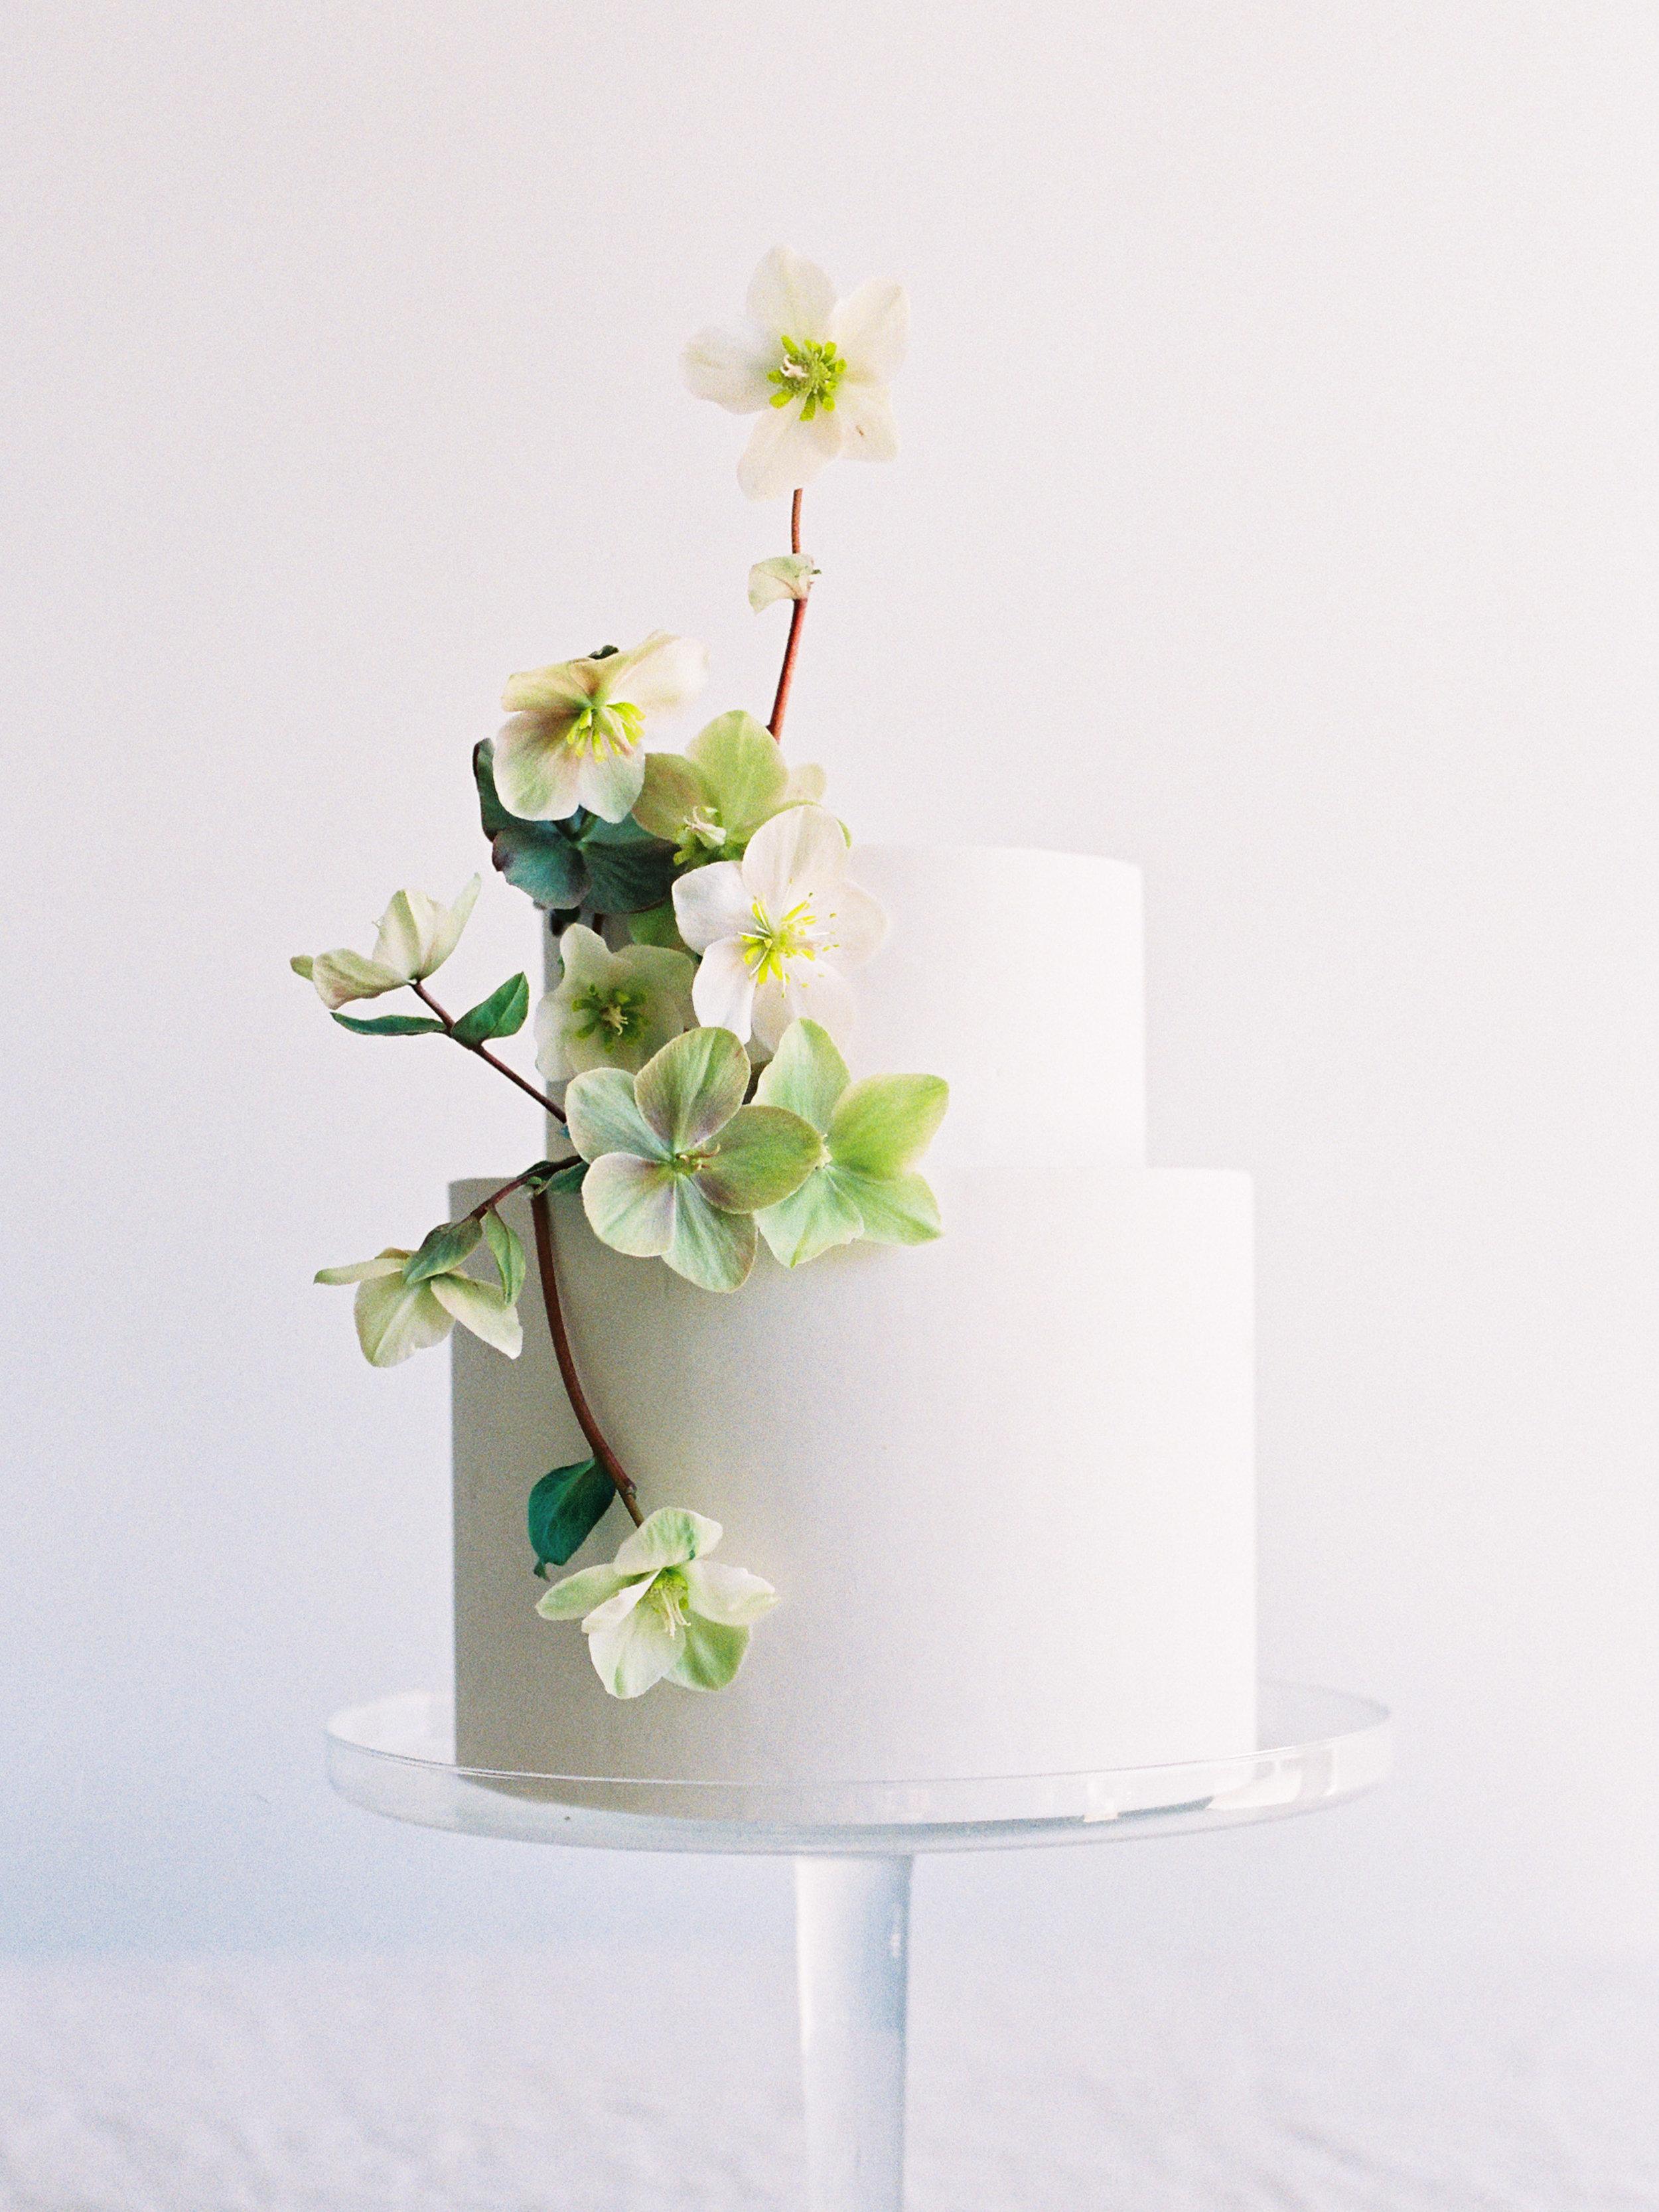 Seasonal Cakes - Studio MondineNine Cakes